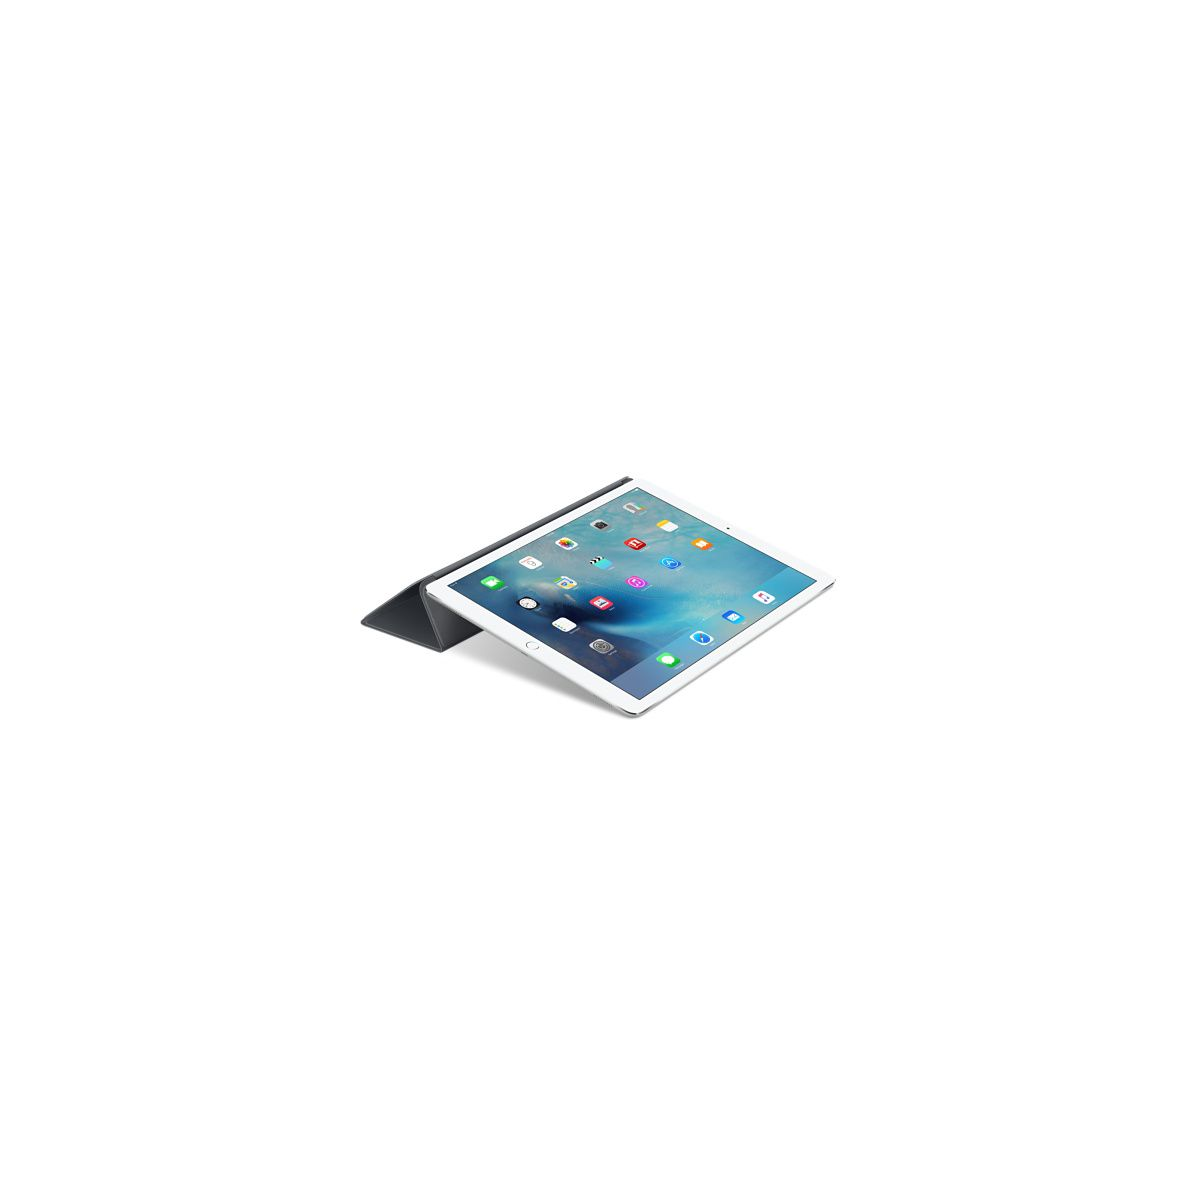 Coque apple ipad pro smart cover silicone gris (photo)